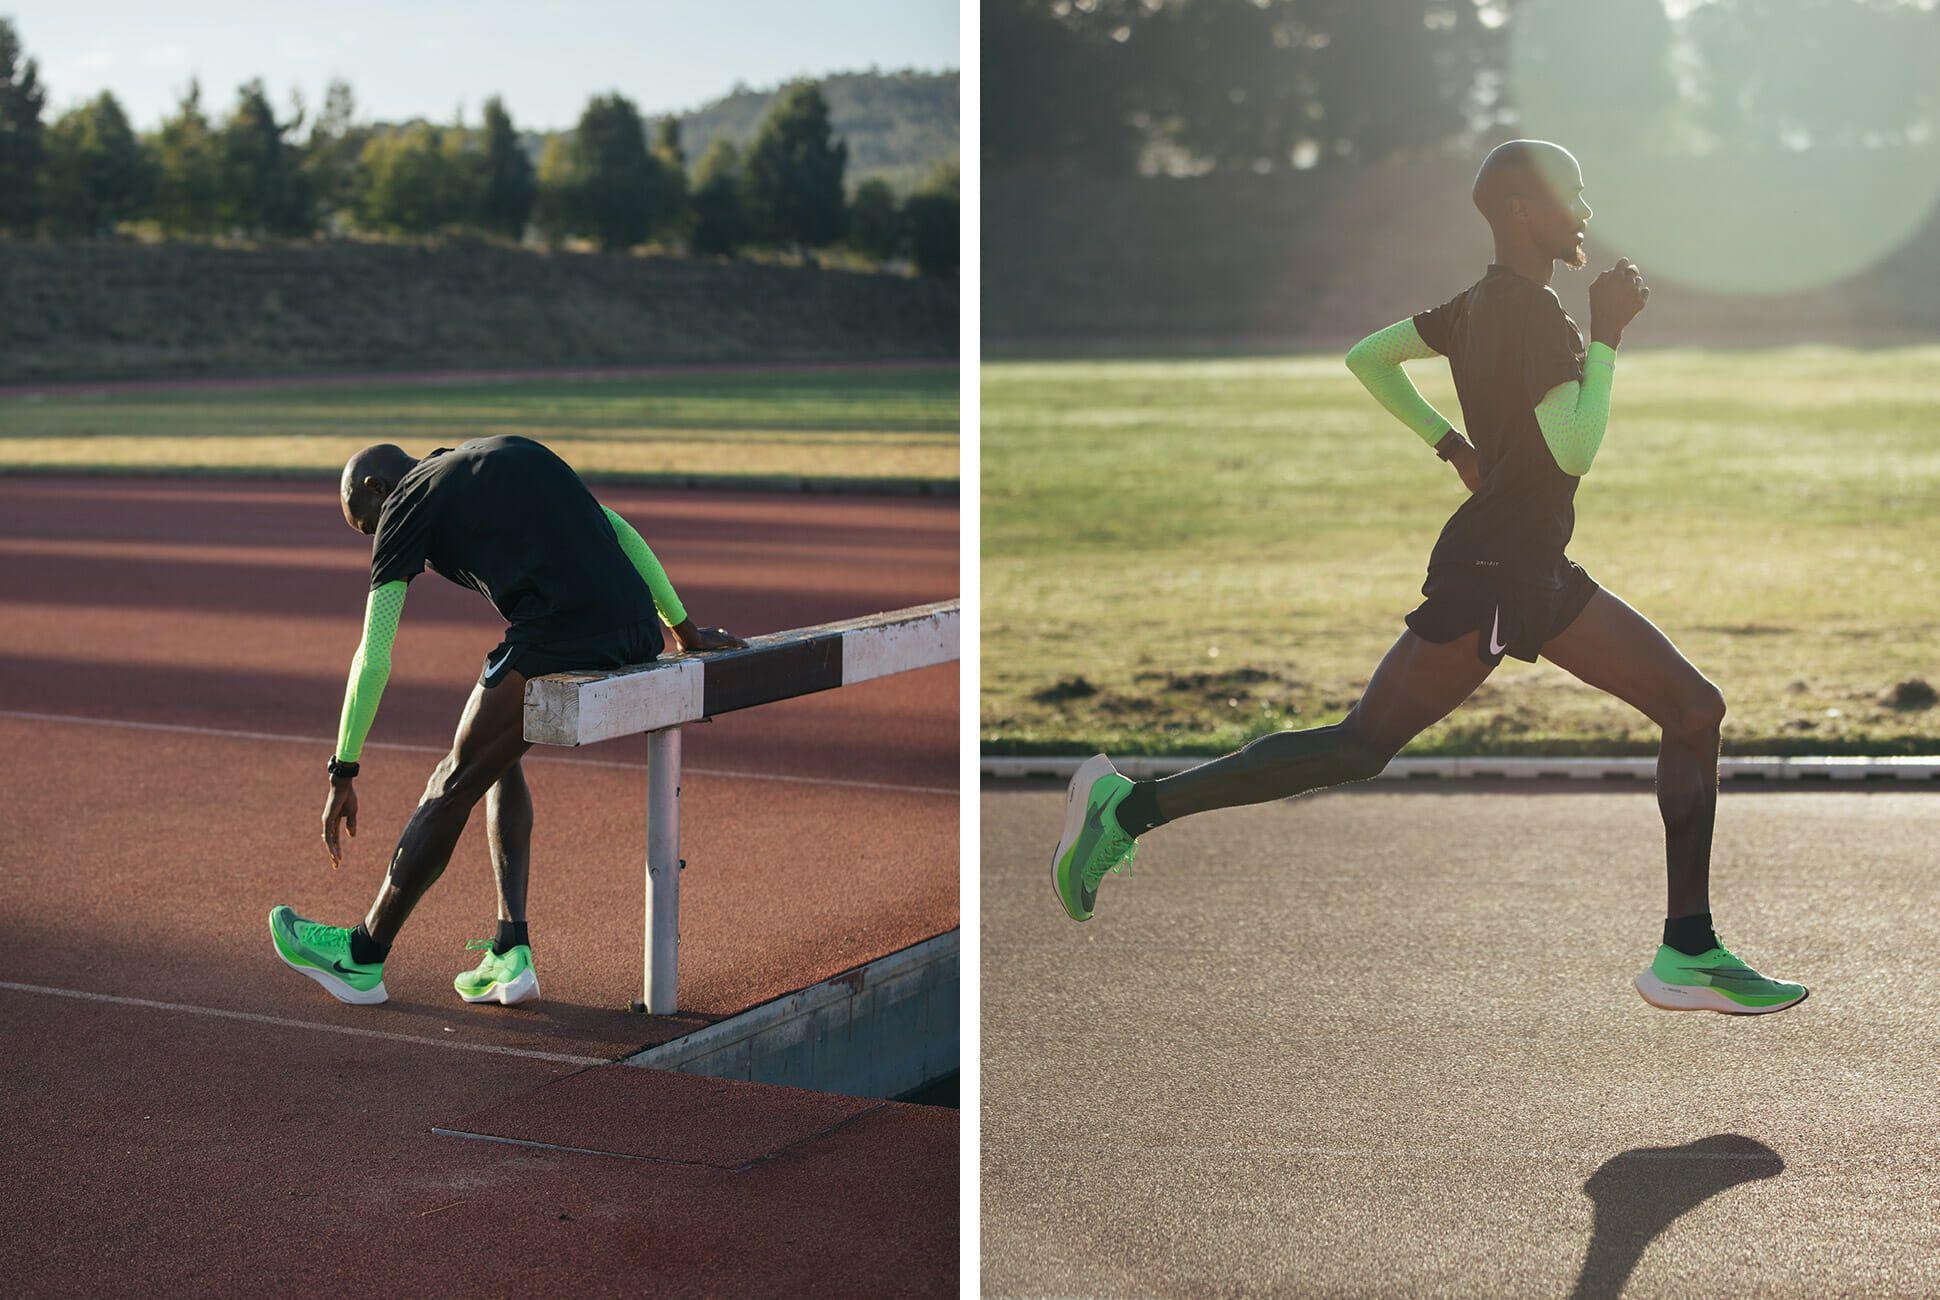 Nike-NXT-Percent-Gear-Patrol-Lifestyle-Slide-01